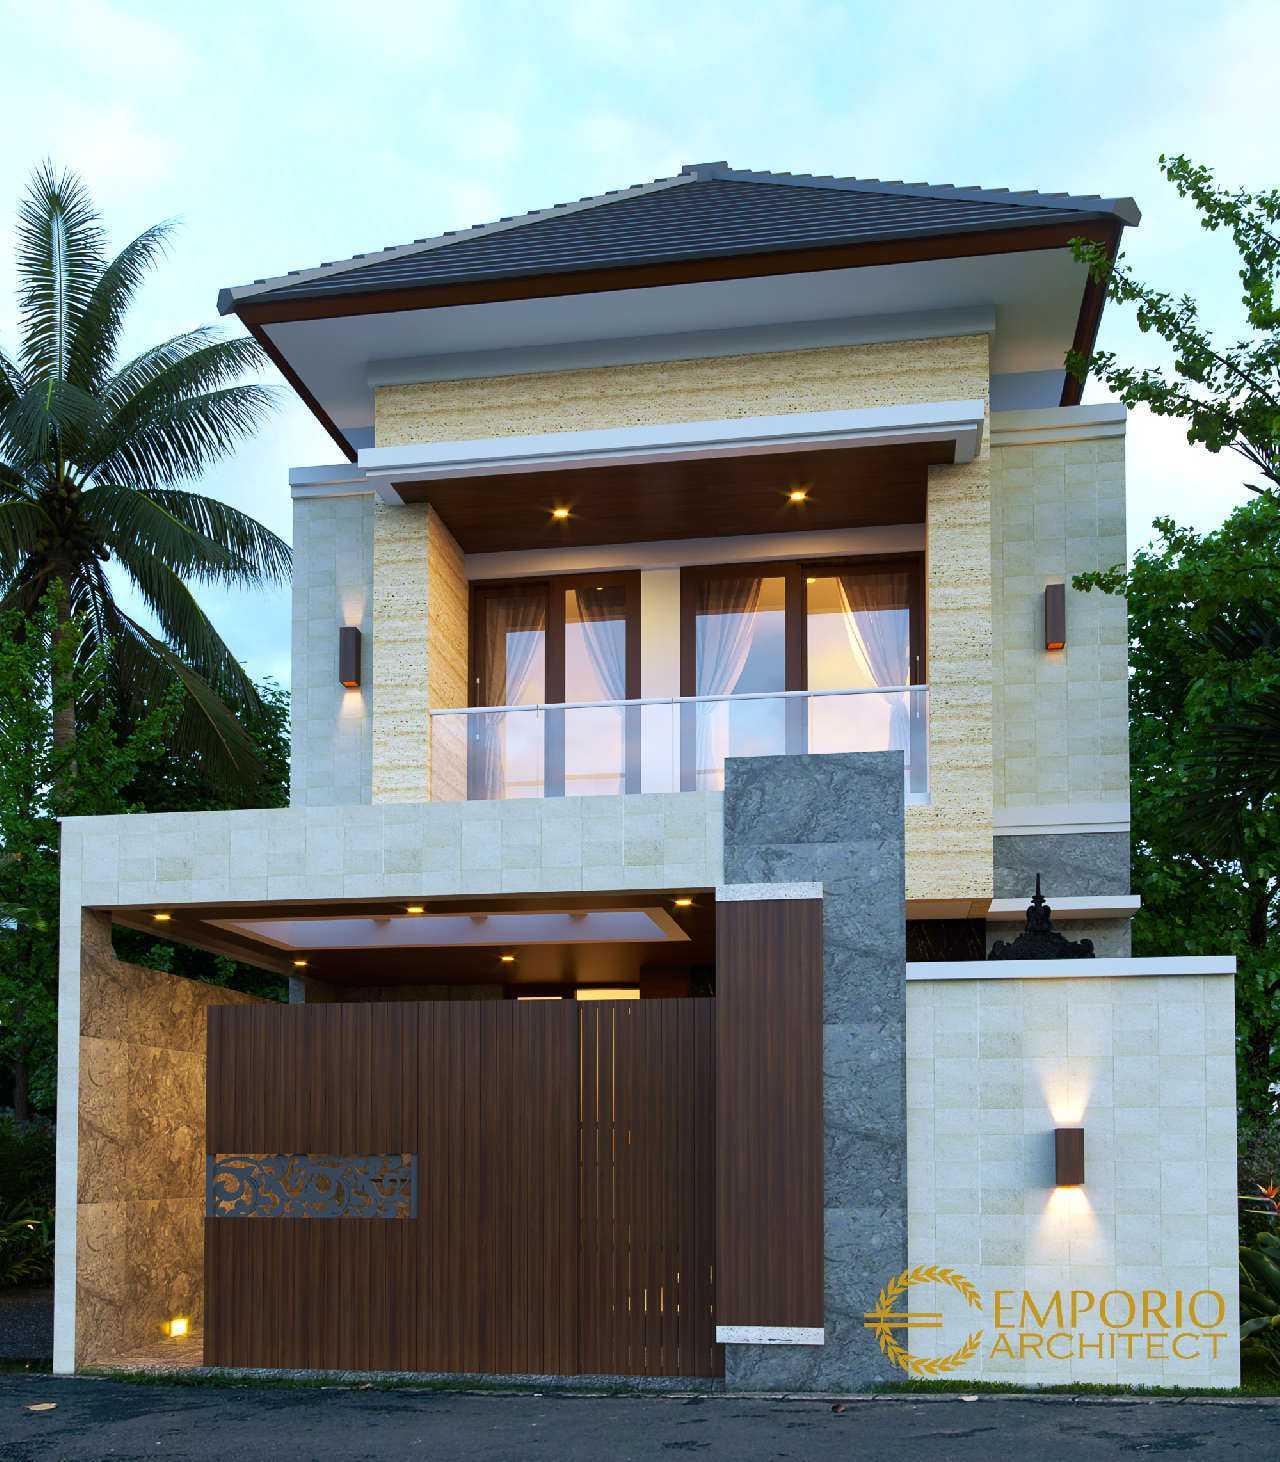 Emporio Architect Jasa Arsitek Badung Desain Rumah Modern 2 Lantai 765 @ Badung, Bali Kabupaten Badung, Bali, Indonesia Kabupaten Badung, Bali, Indonesia Emporio-Architect-Jasa-Arsitek-Badung-Desain-Rumah-Modern-2-Lantai-765-Badung-Bali  87393